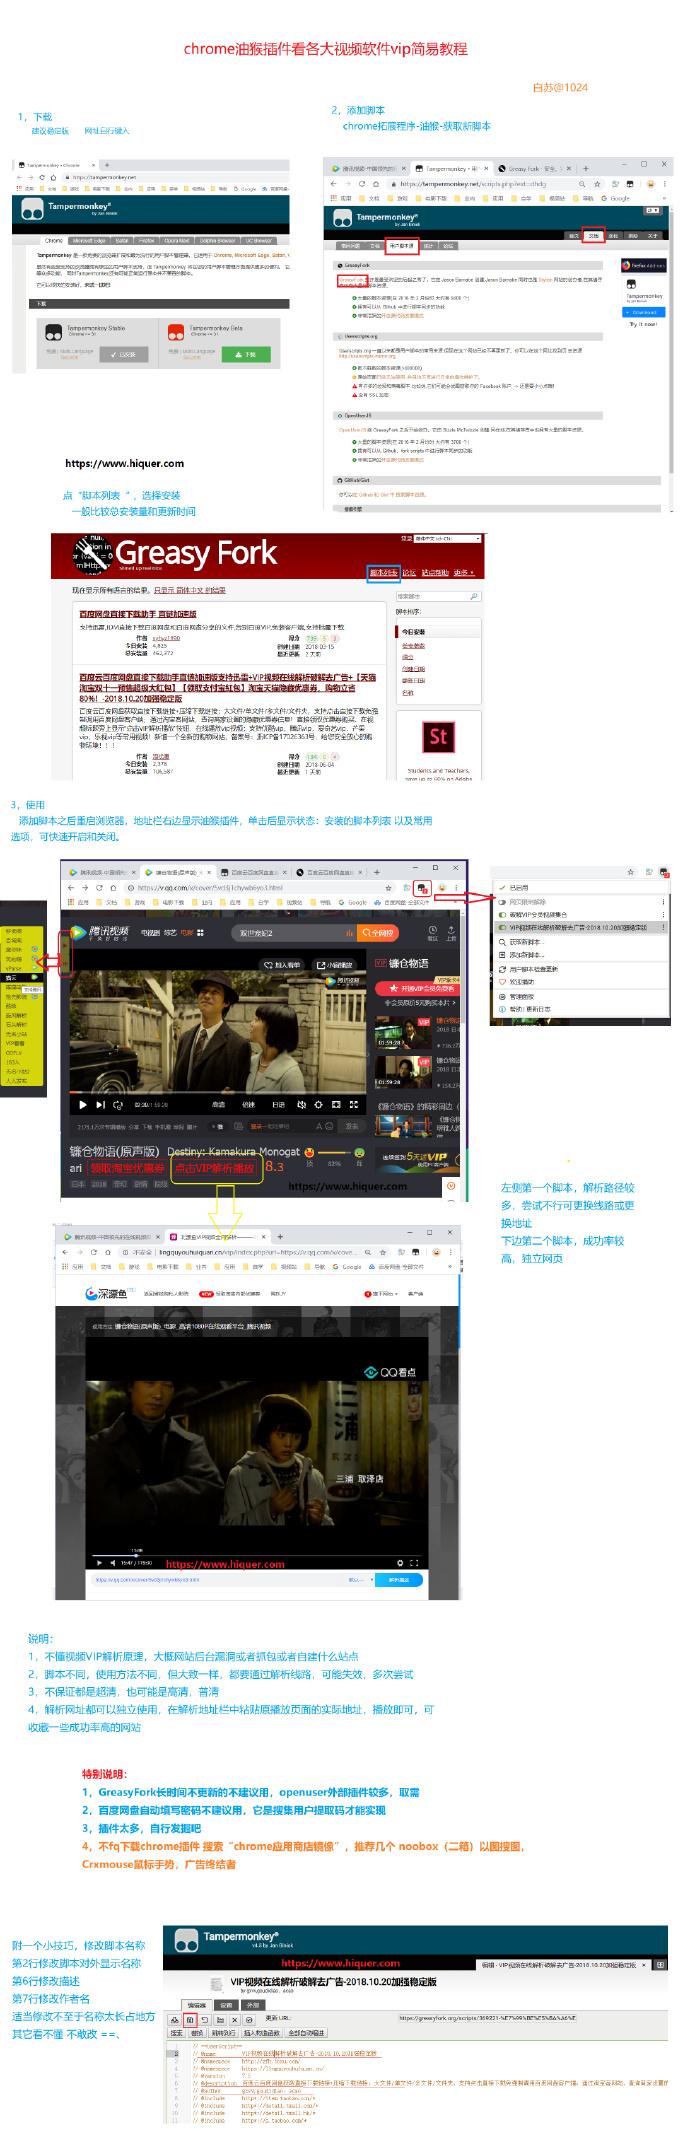 chrome浏览器油猴看各大视频网站vip简易教程(新手向) 老司机 第2张